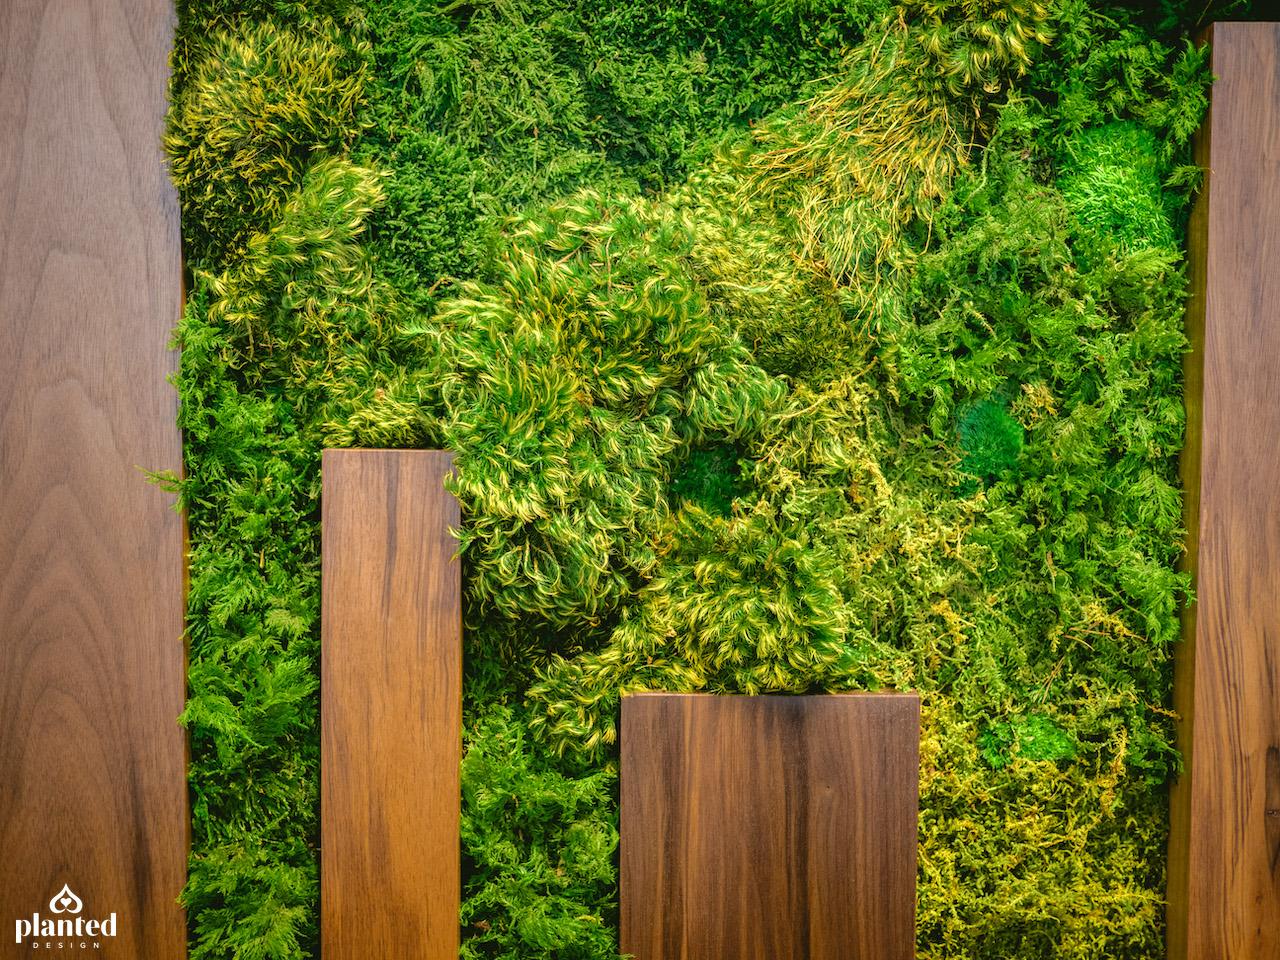 PlantedDesign_MossWall_PerfectDayFoods_Emeryville_California_Office-12_fixed.jpg